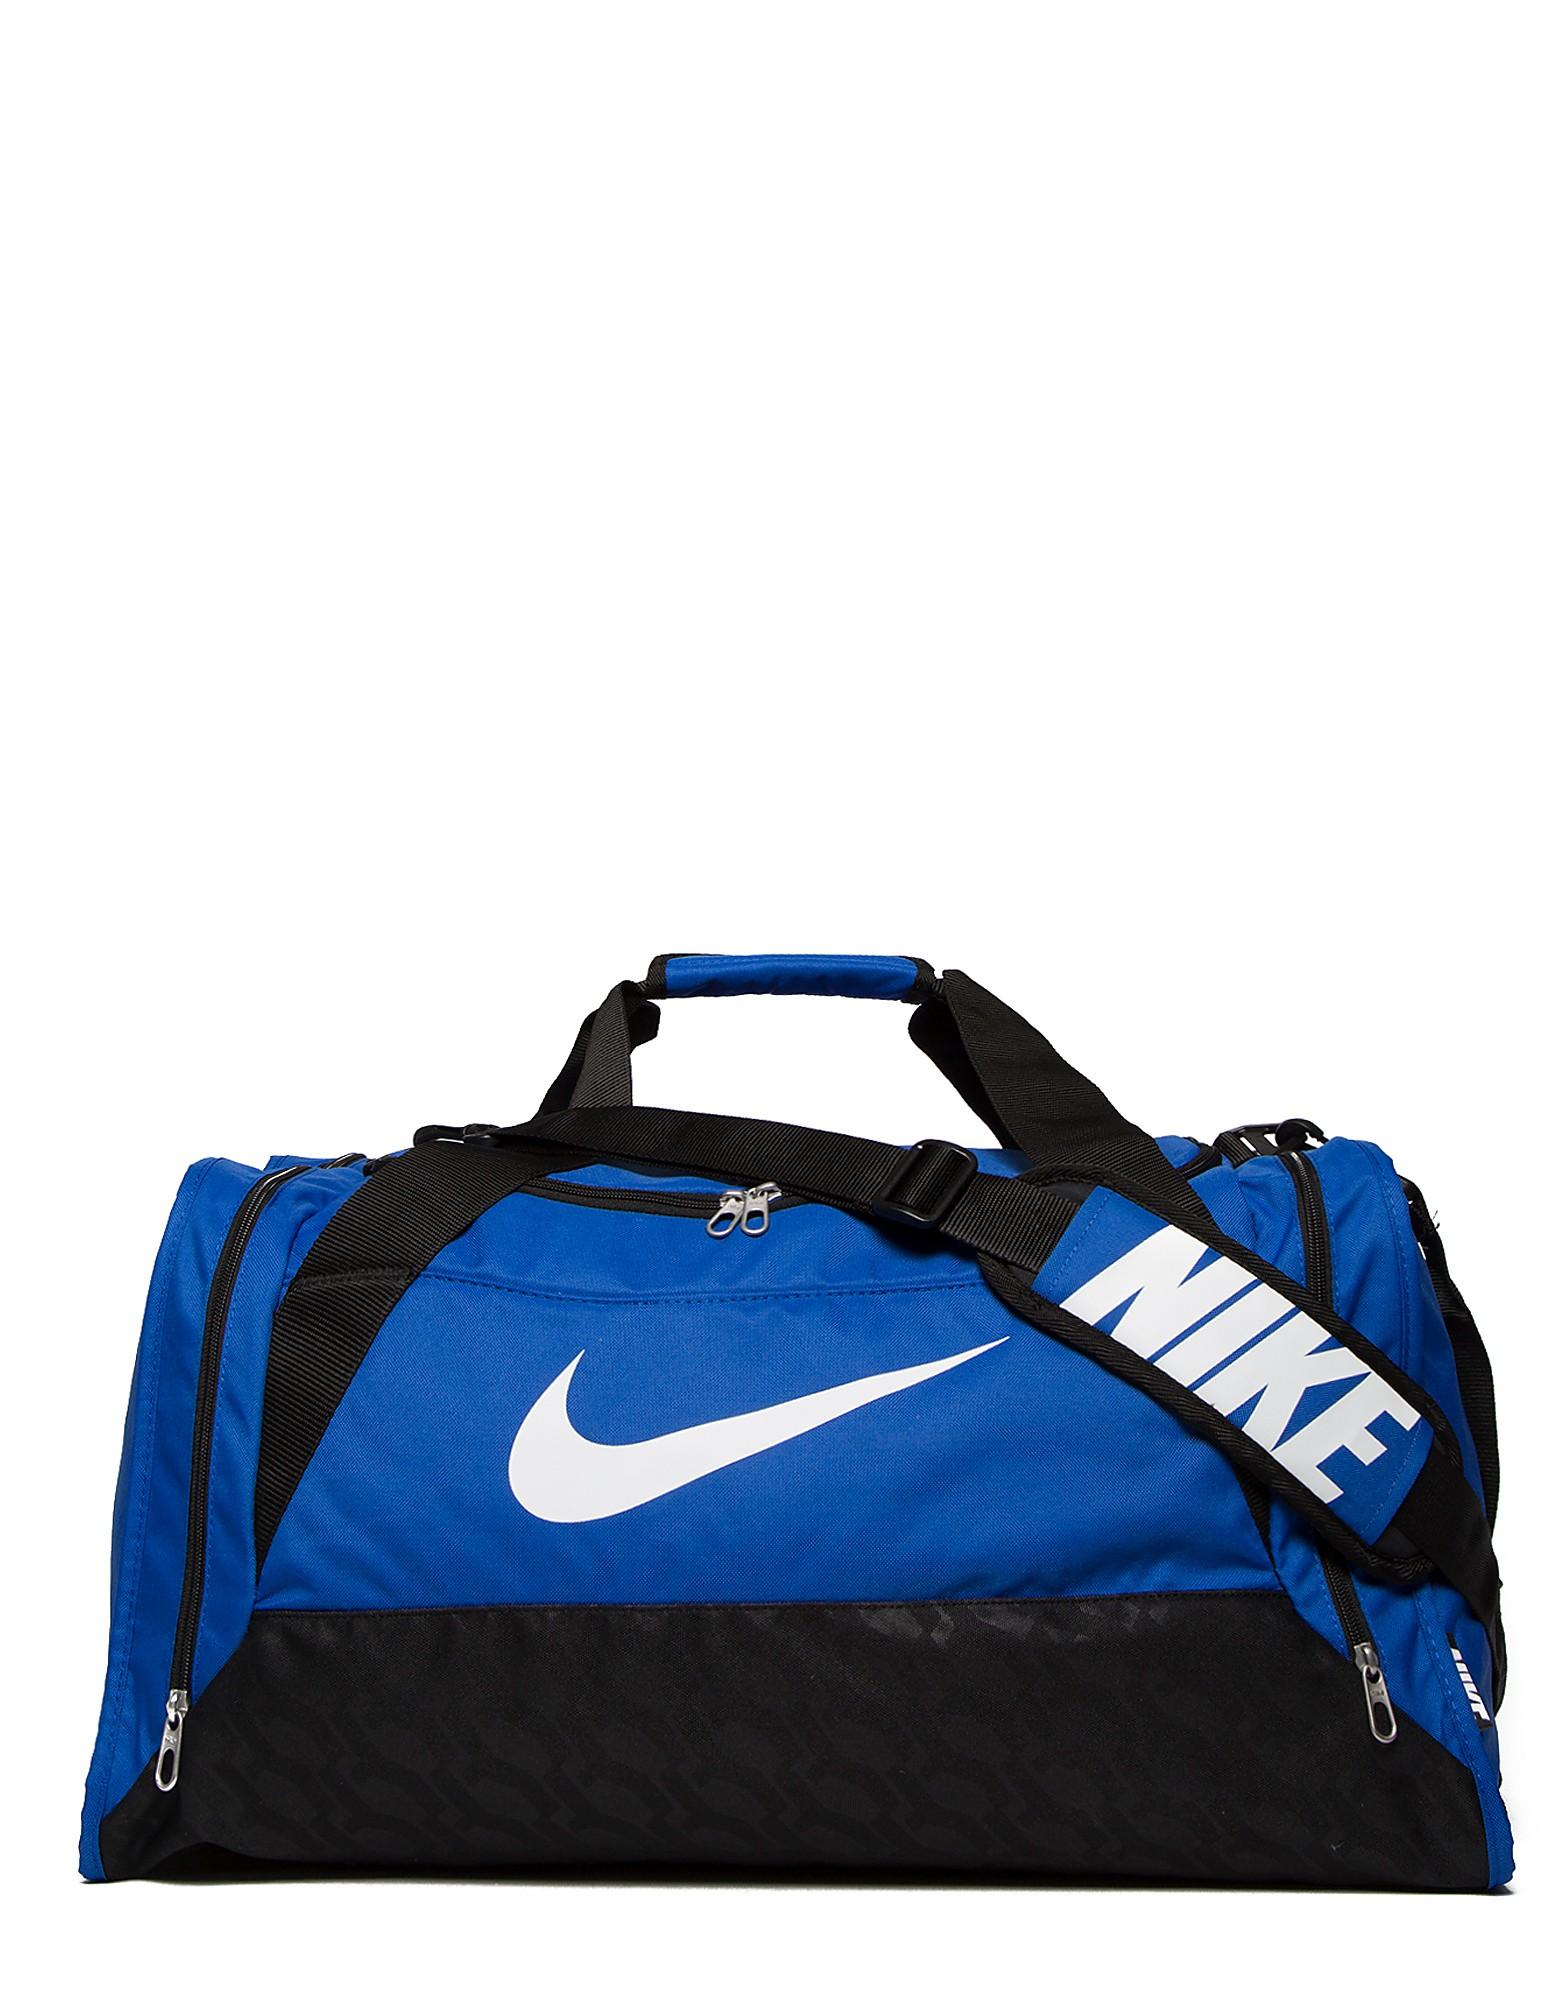 Nike Brasilia 6 Duffel Bag - Royal/White - Mens, Royal/White